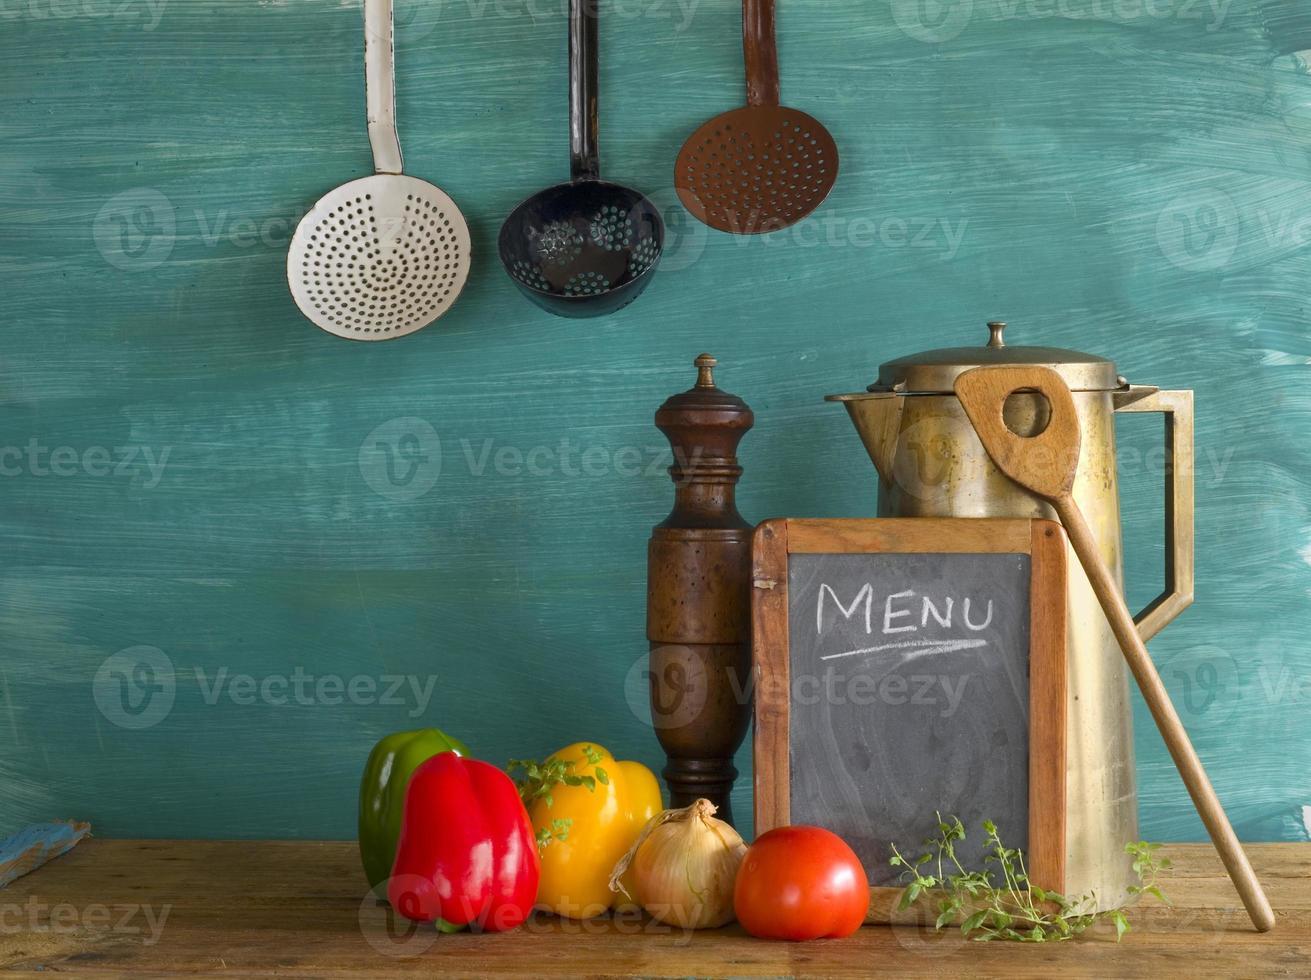 menu w. voedselingrediënten, kookrecepten foto